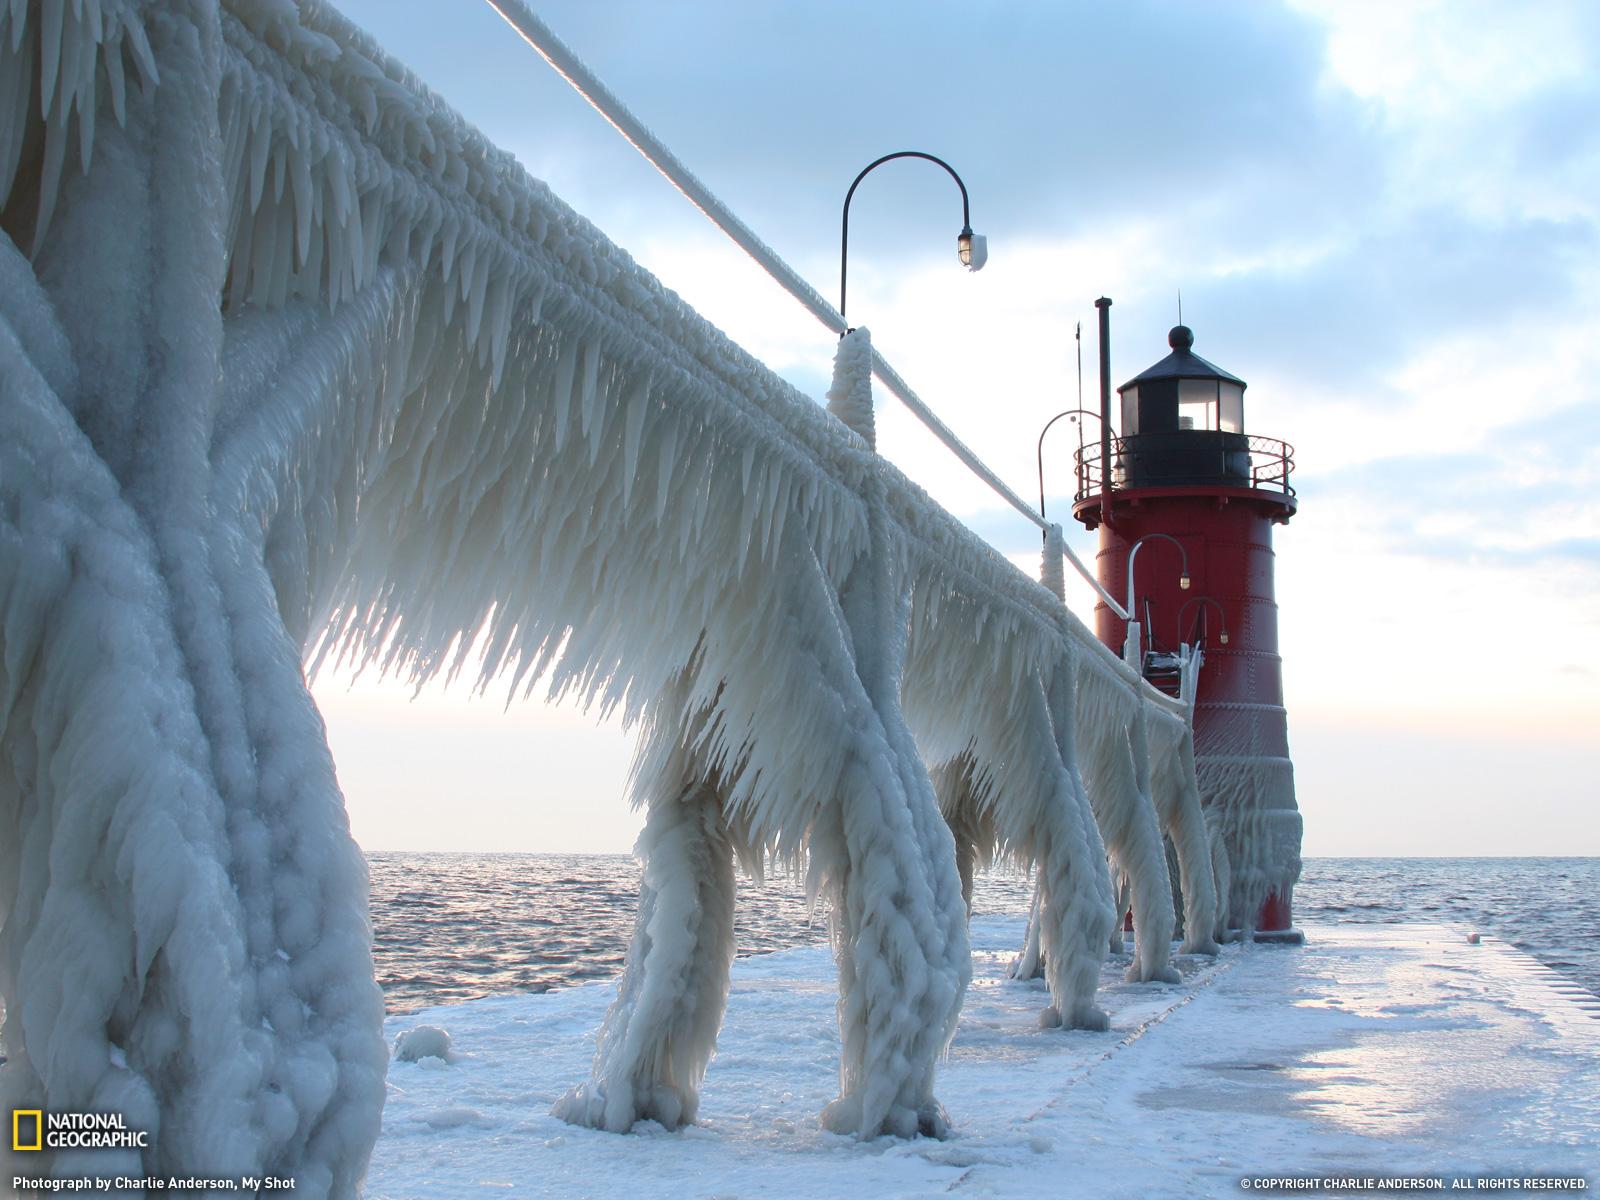 Michigan Photo Winter Wallpaper National Geographic Photo of 1600x1200